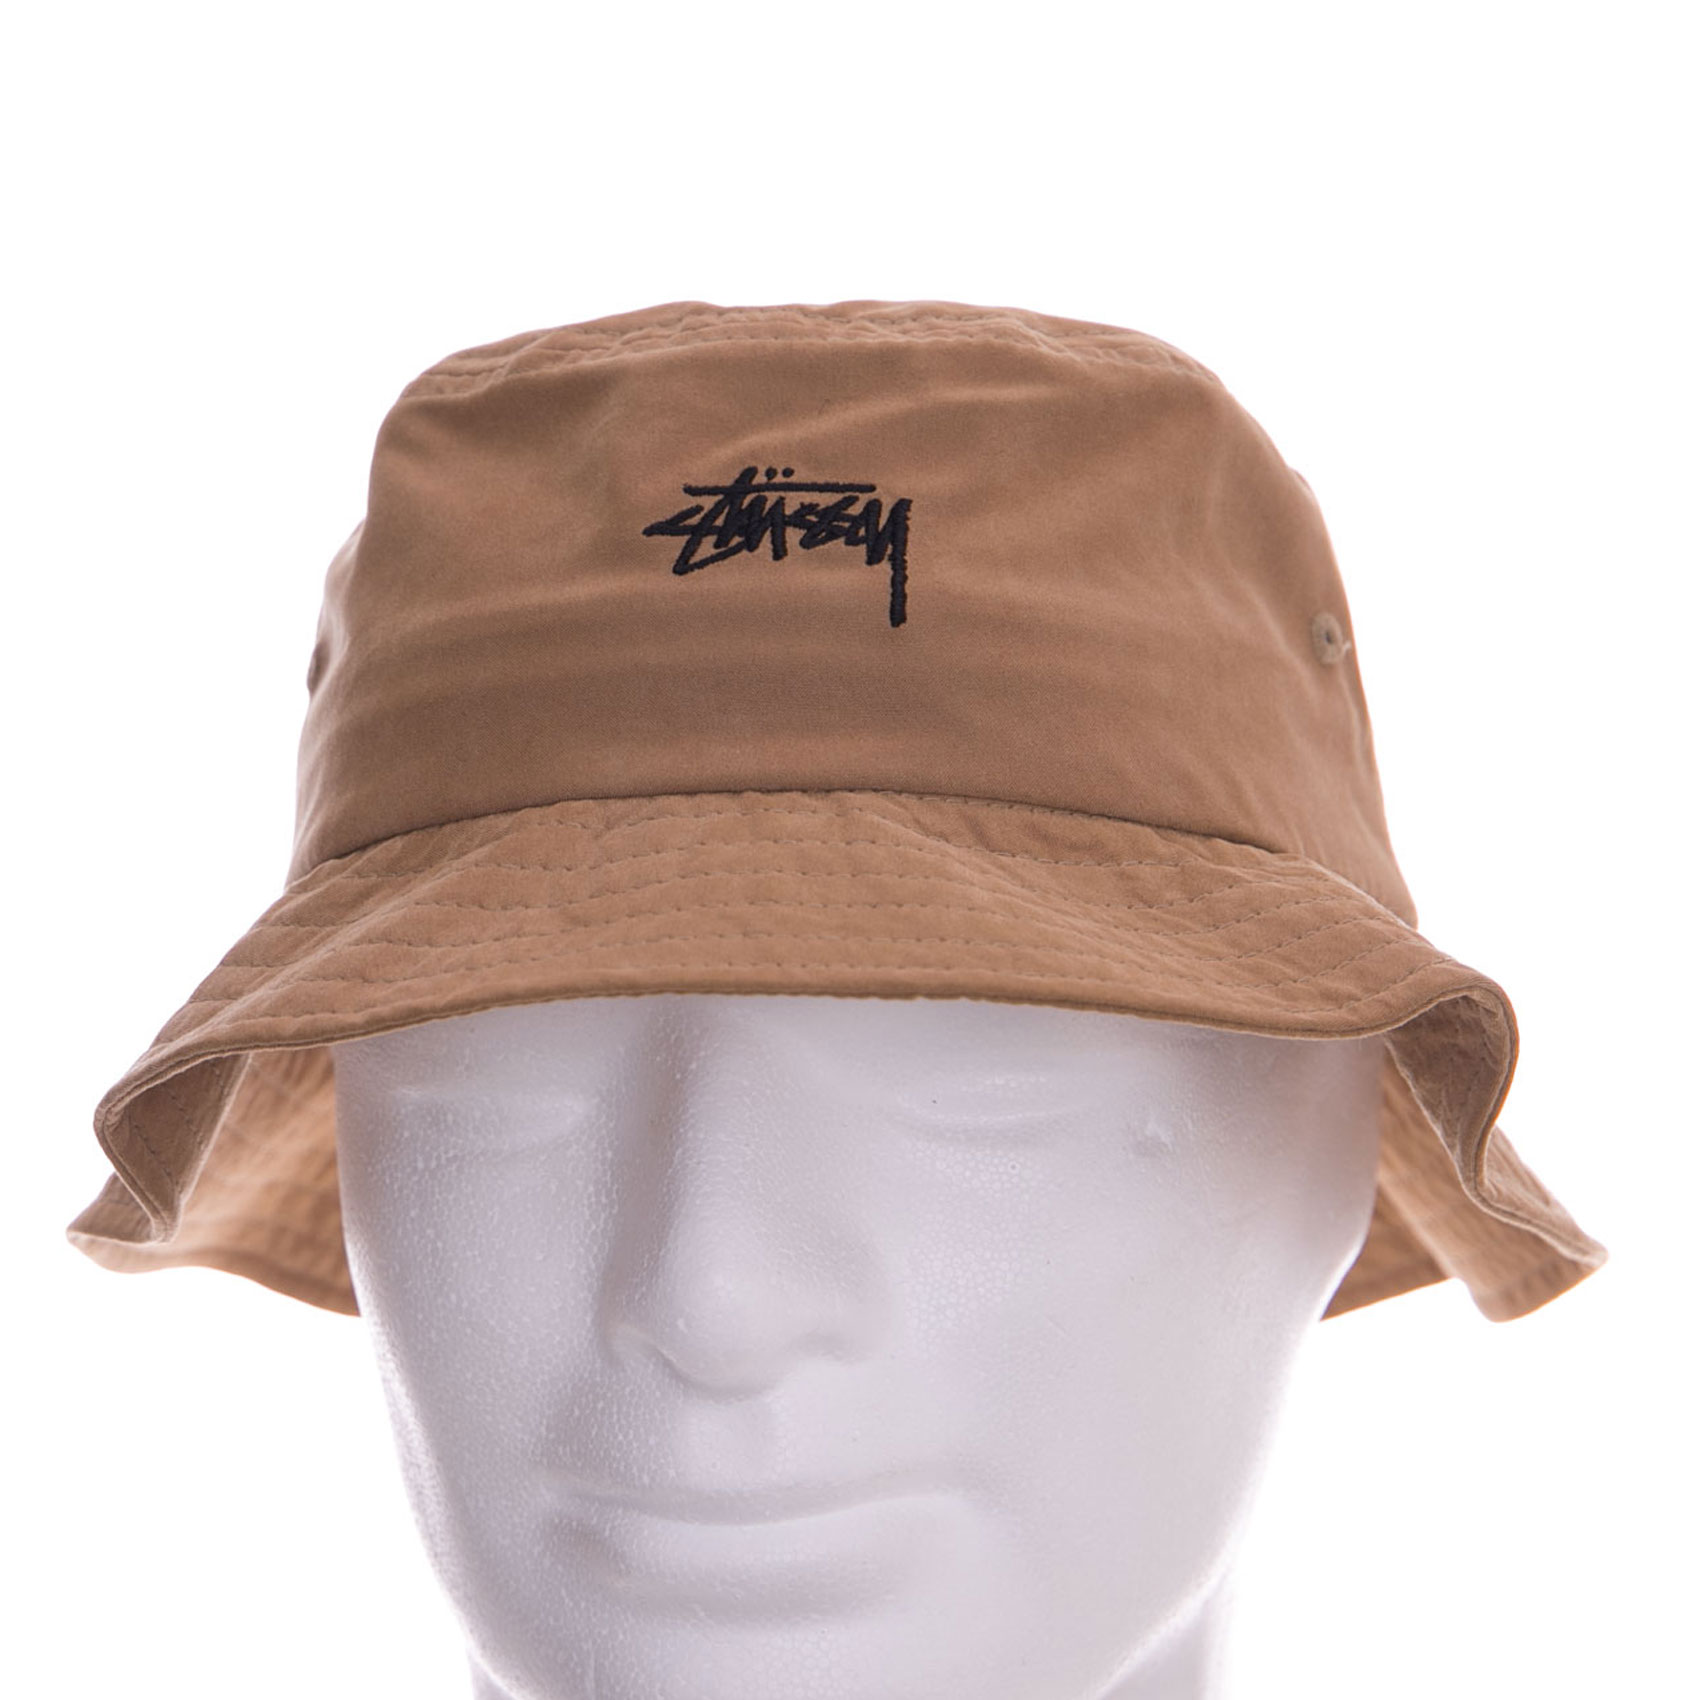 cf94ec2e443 Stussy Cappelli Stock Bucket Hat Camel Marrone